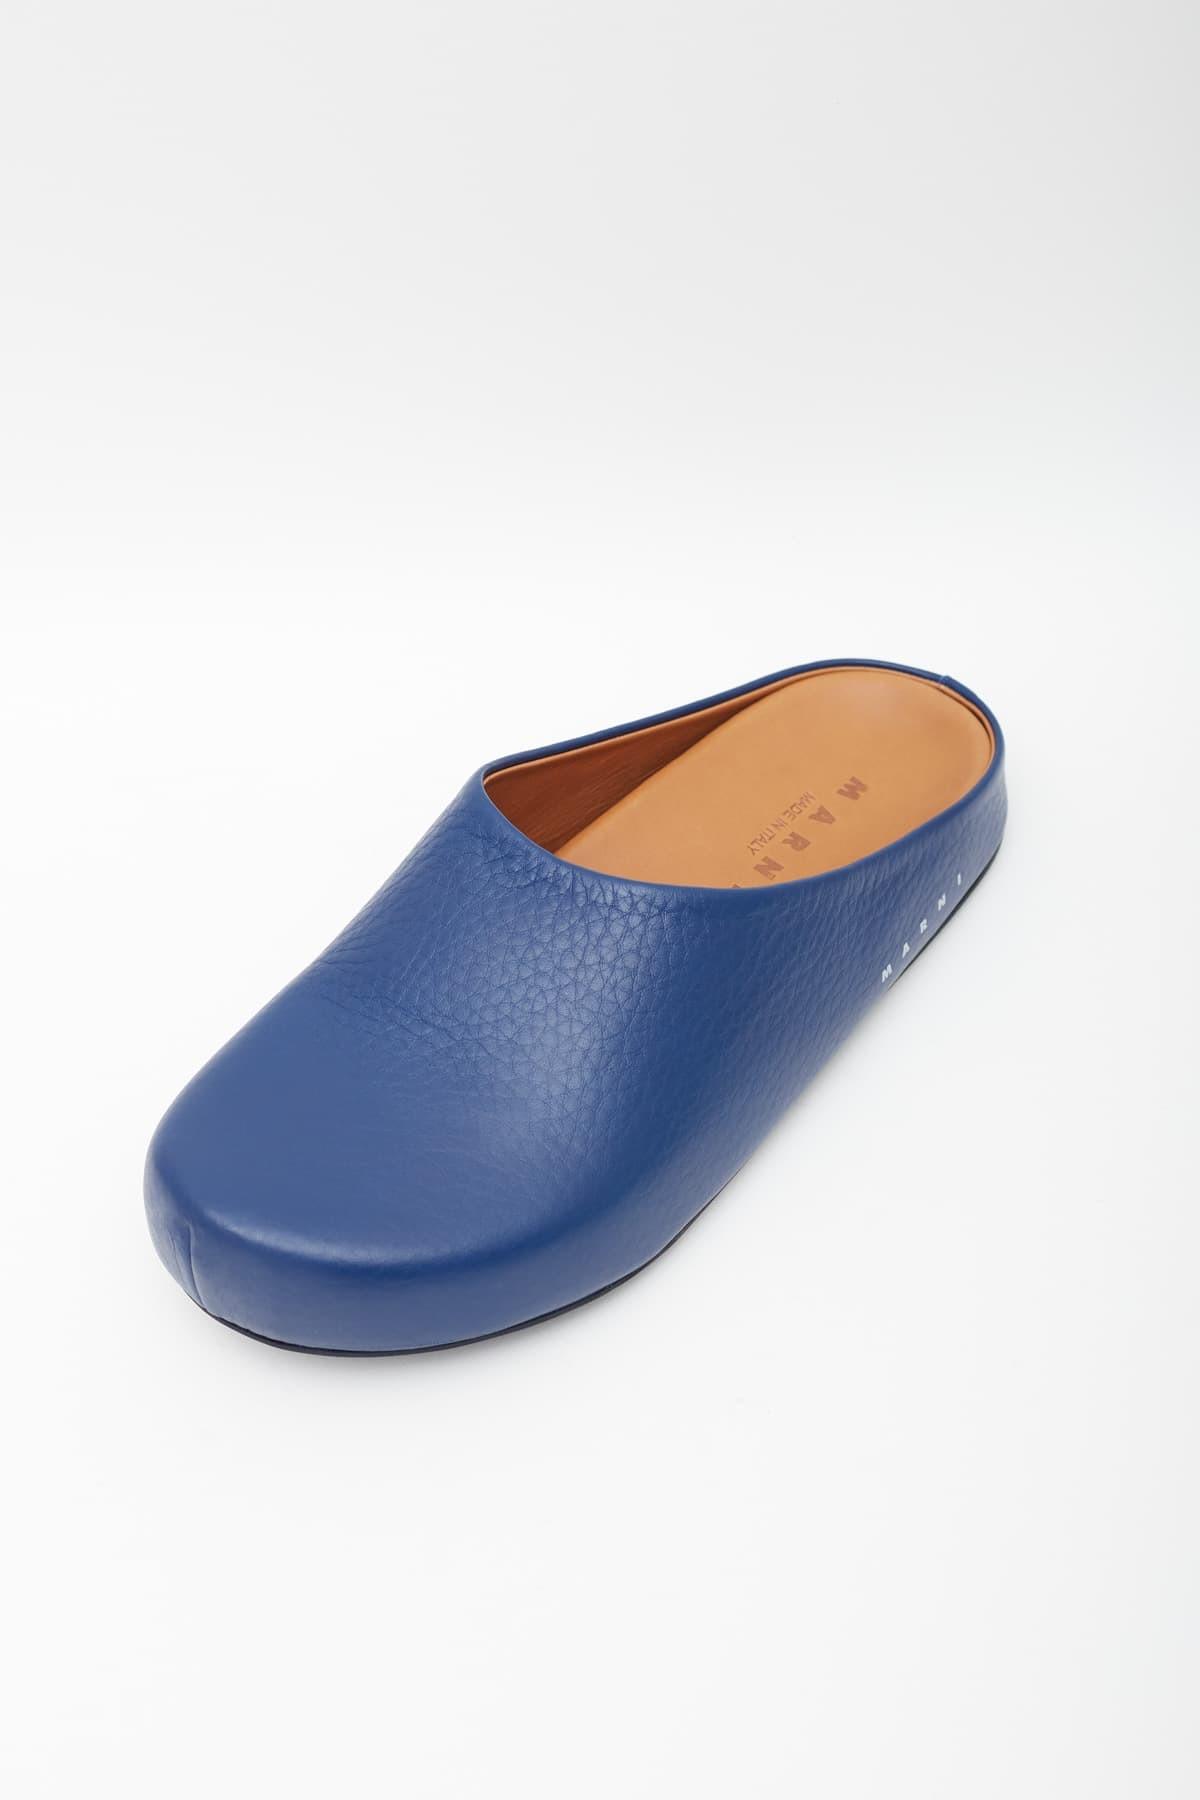 Comprar Marni Blue Fisherman Hat